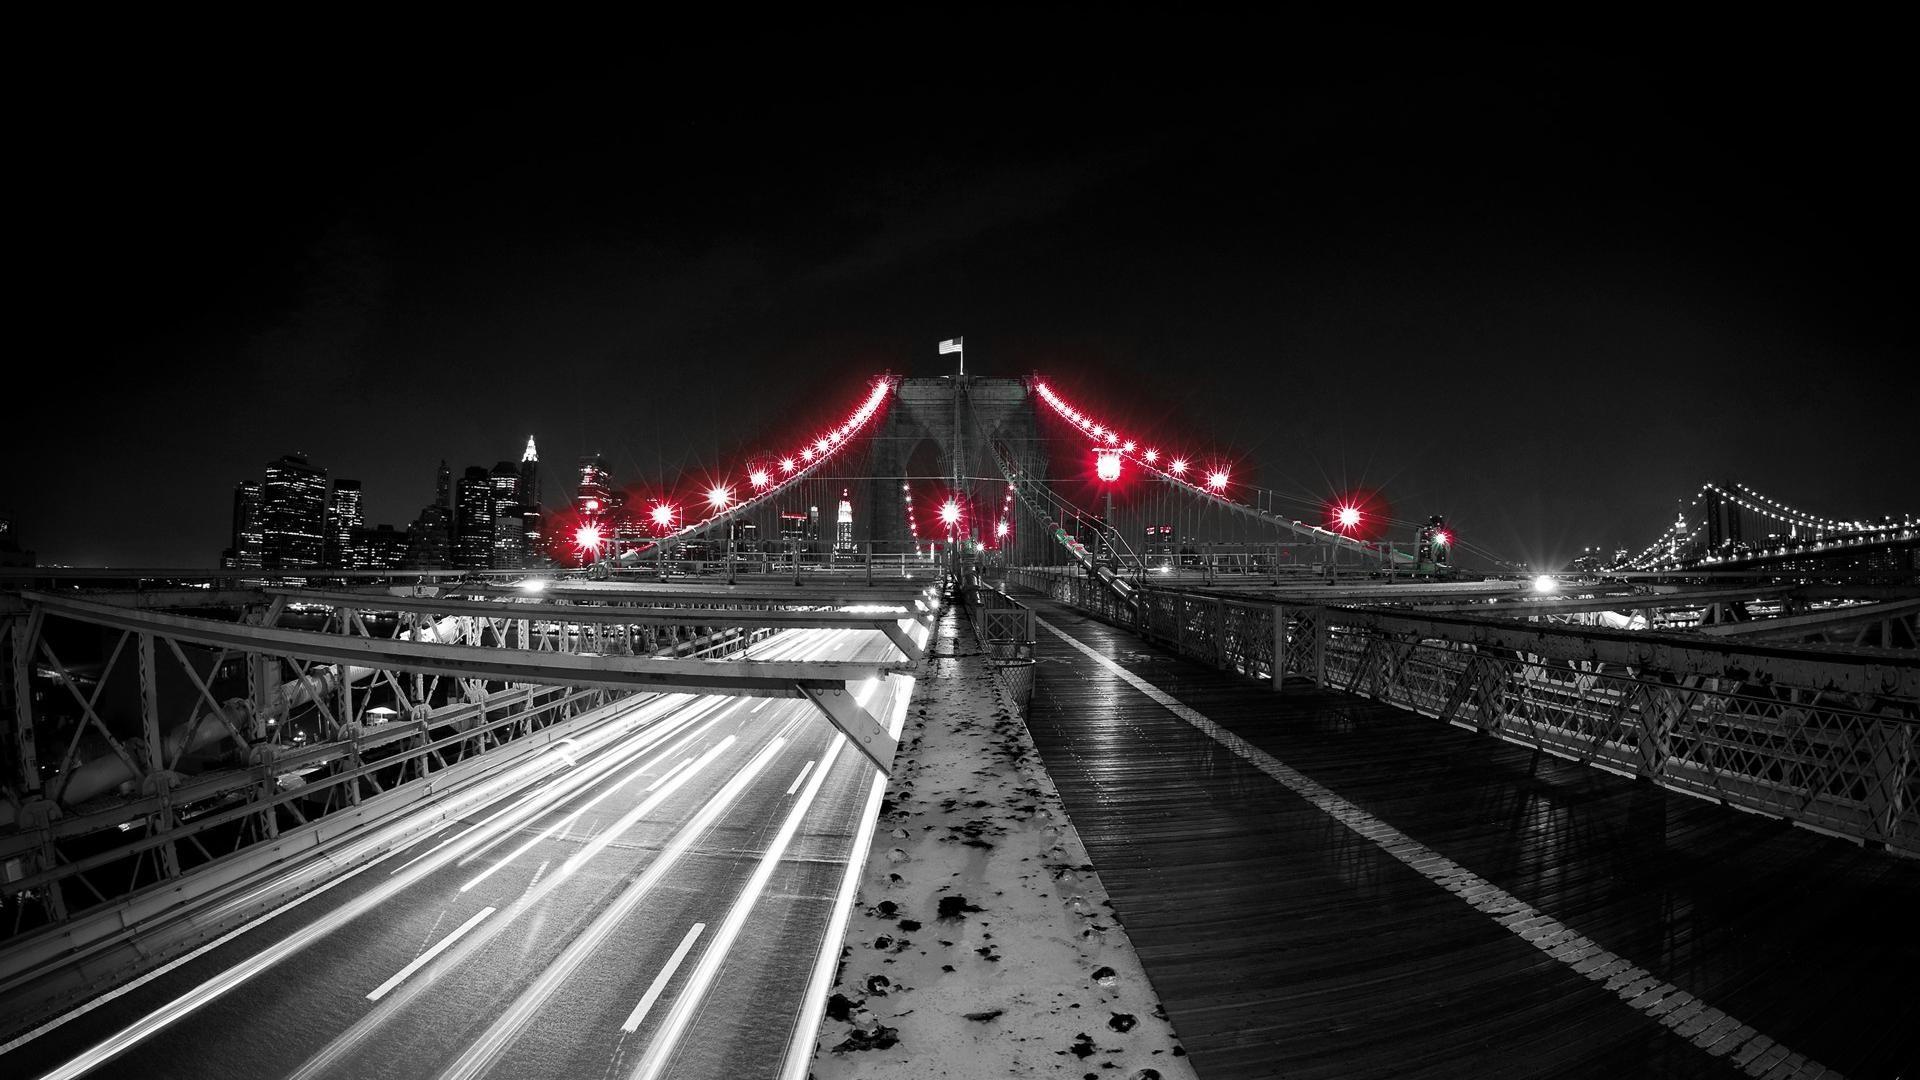 Red Black and White | Black Red Light Bridge White Up Net Wallpaper with  .